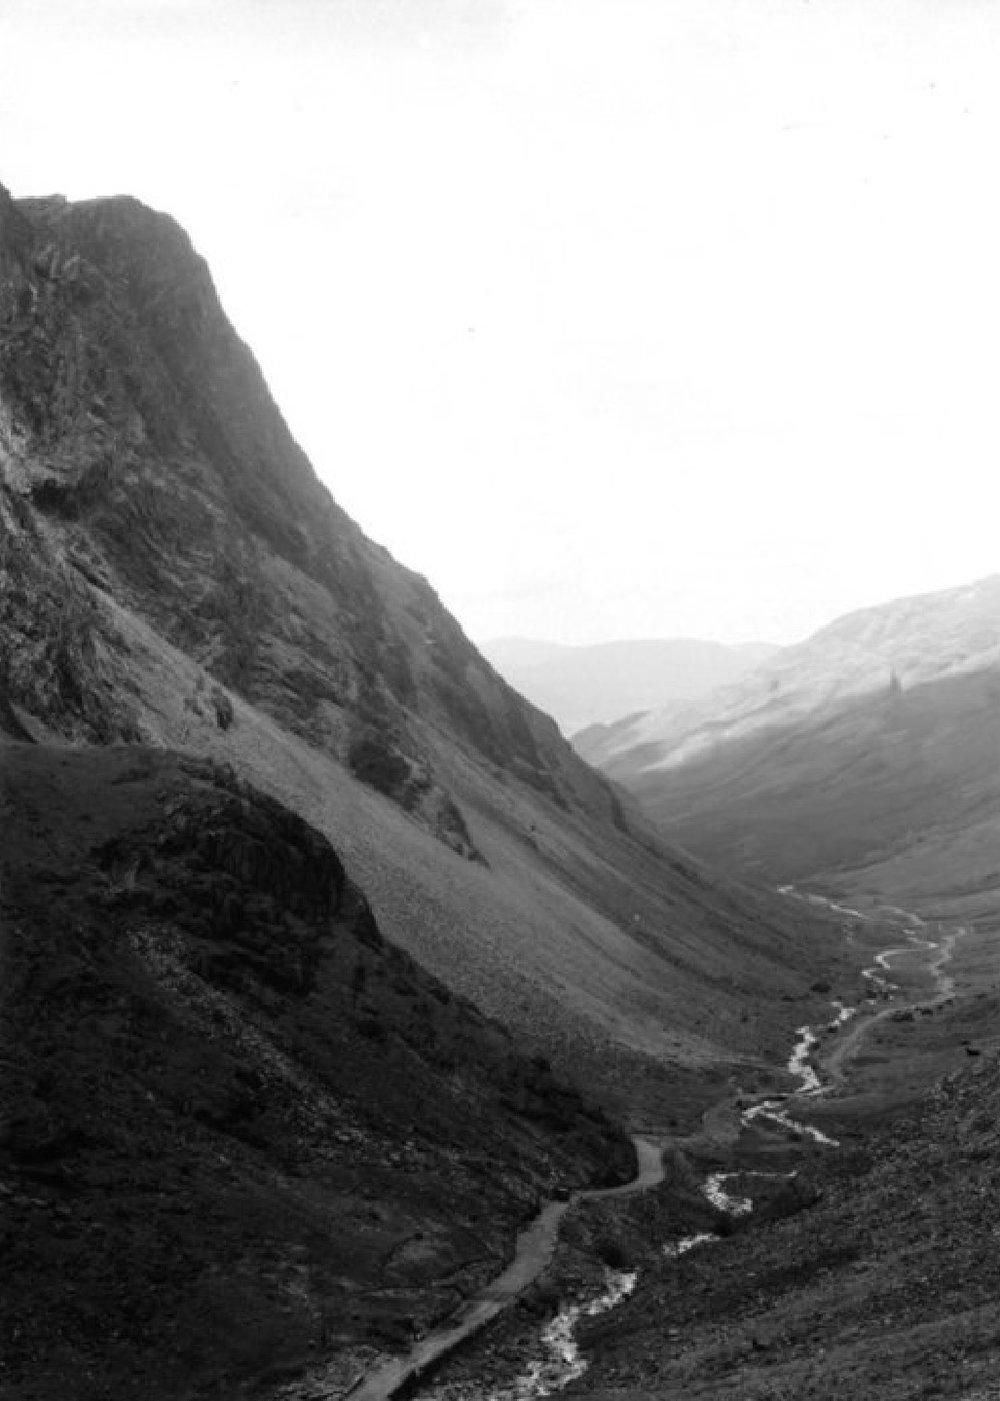 Cumbrian Slate mine, 1942